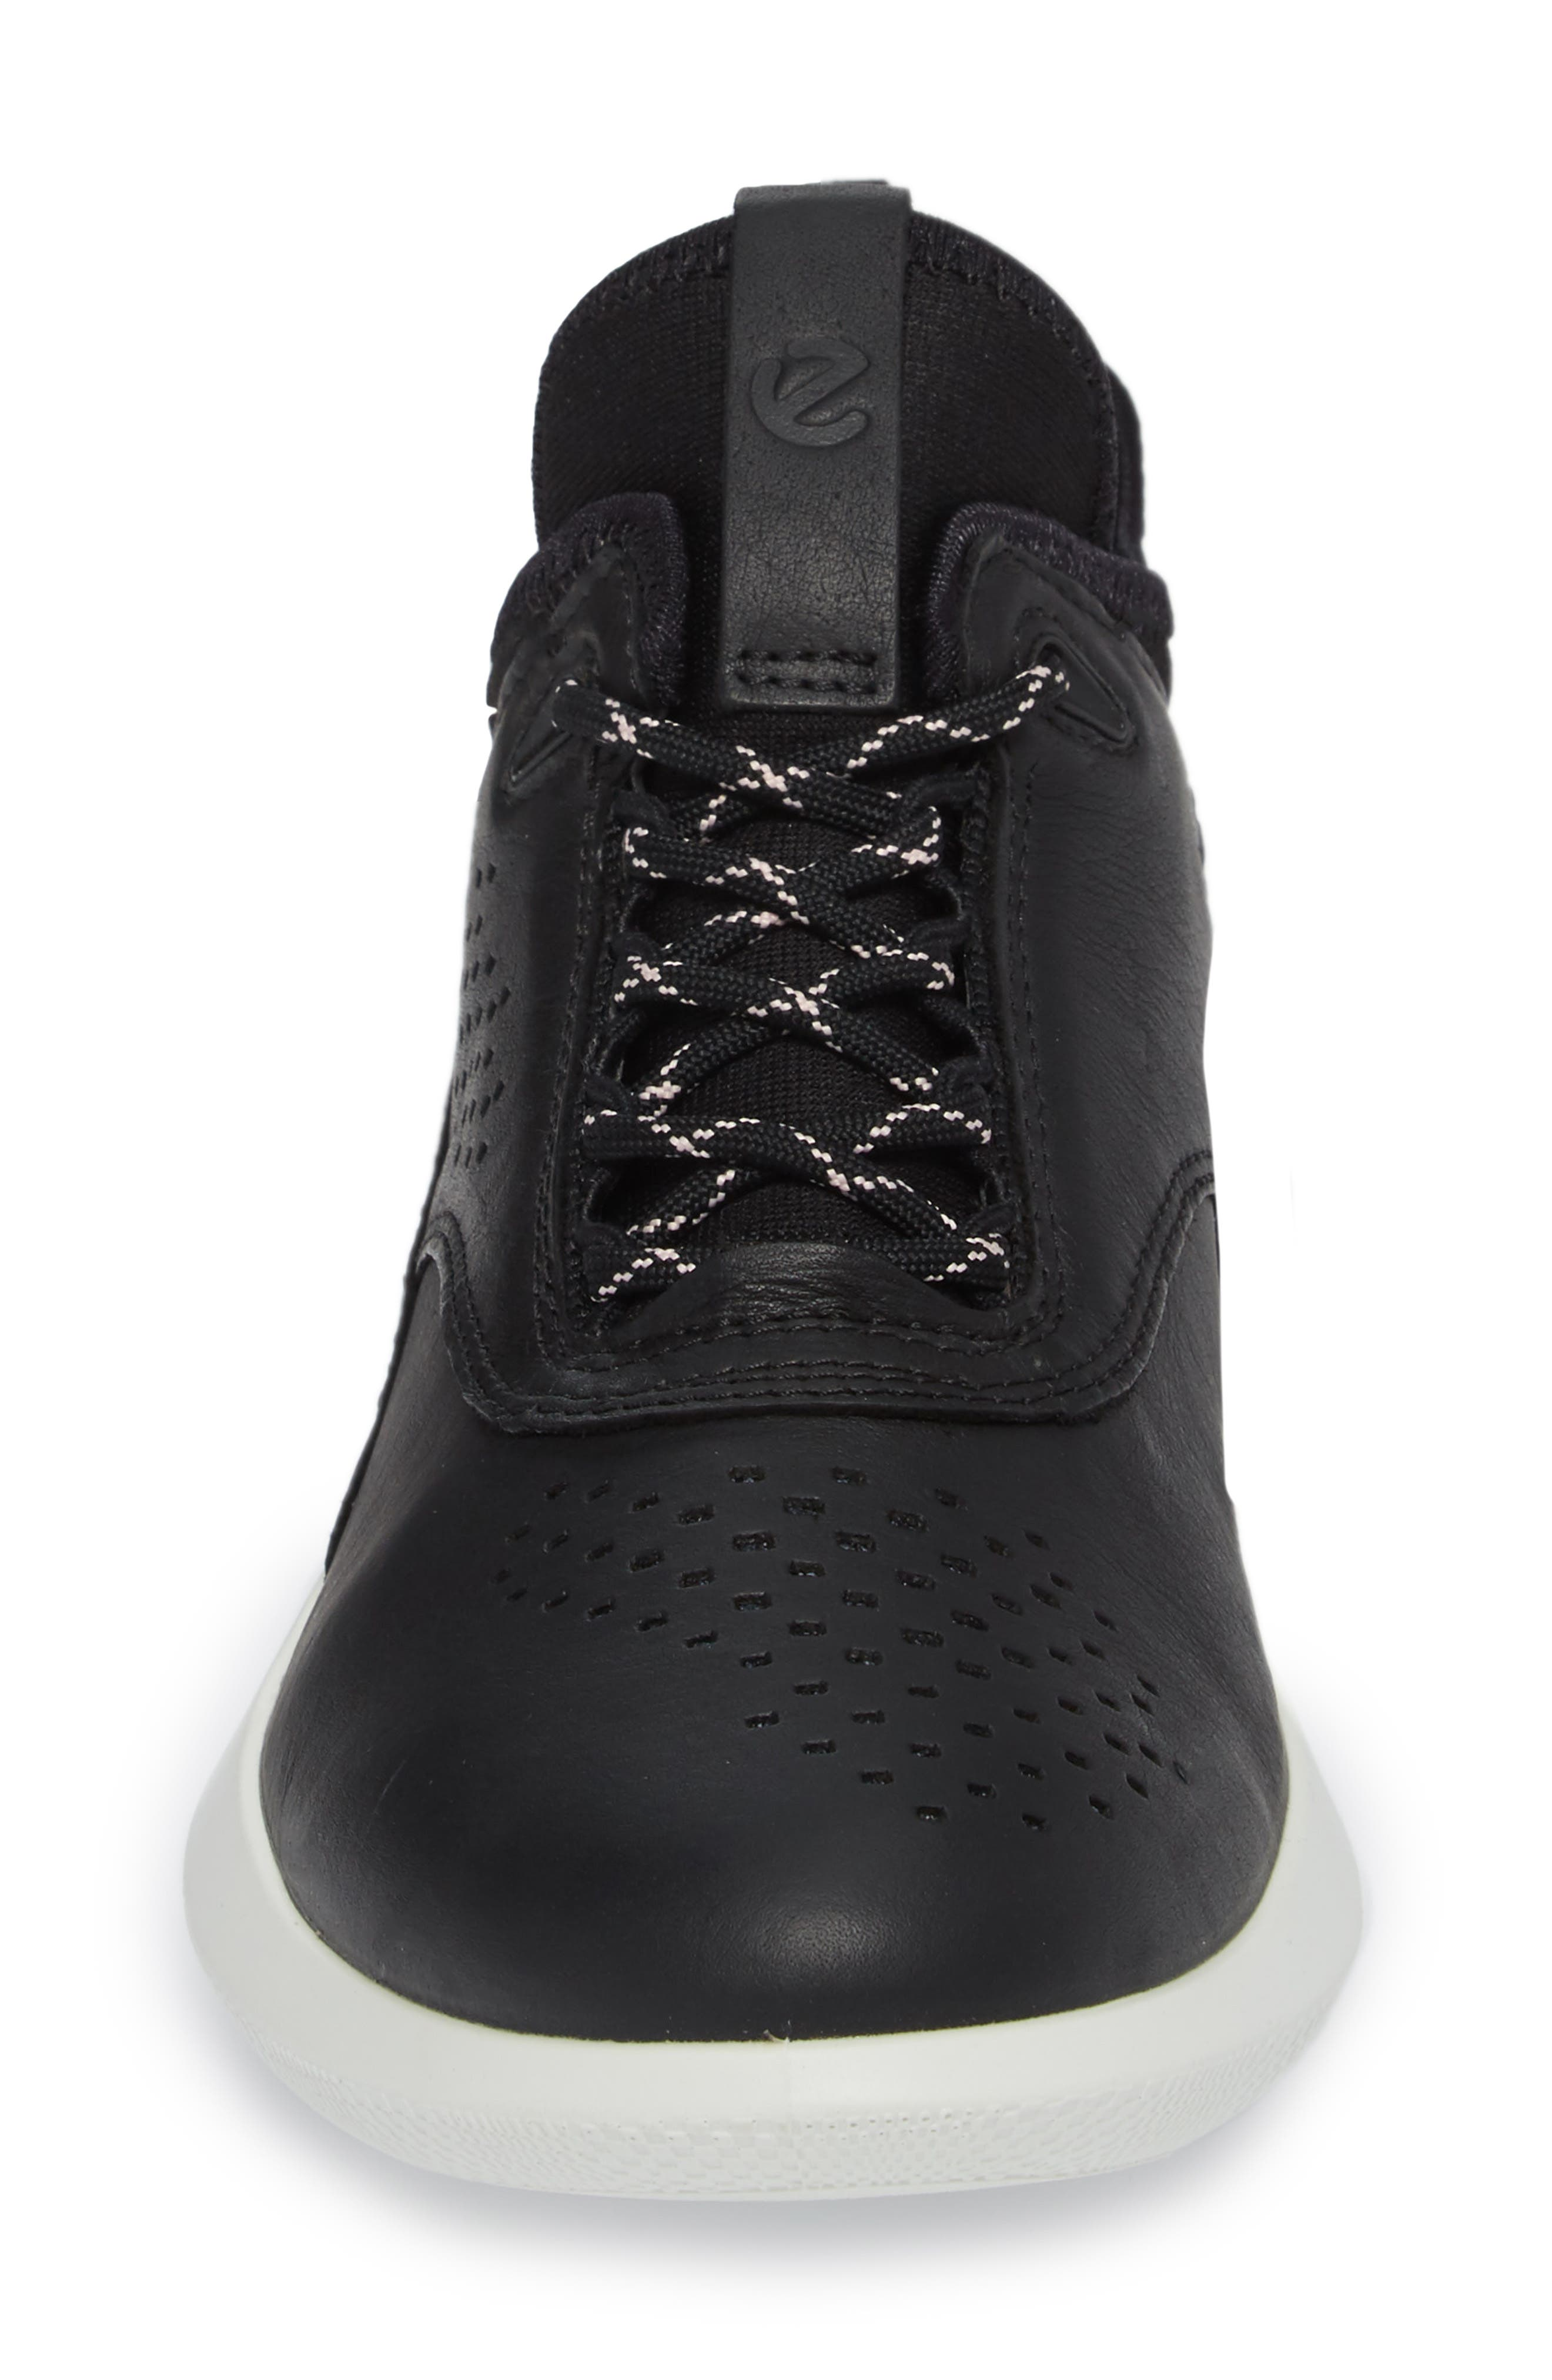 Scinapse Sneaker,                             Alternate thumbnail 4, color,                             BLACK LEATHER